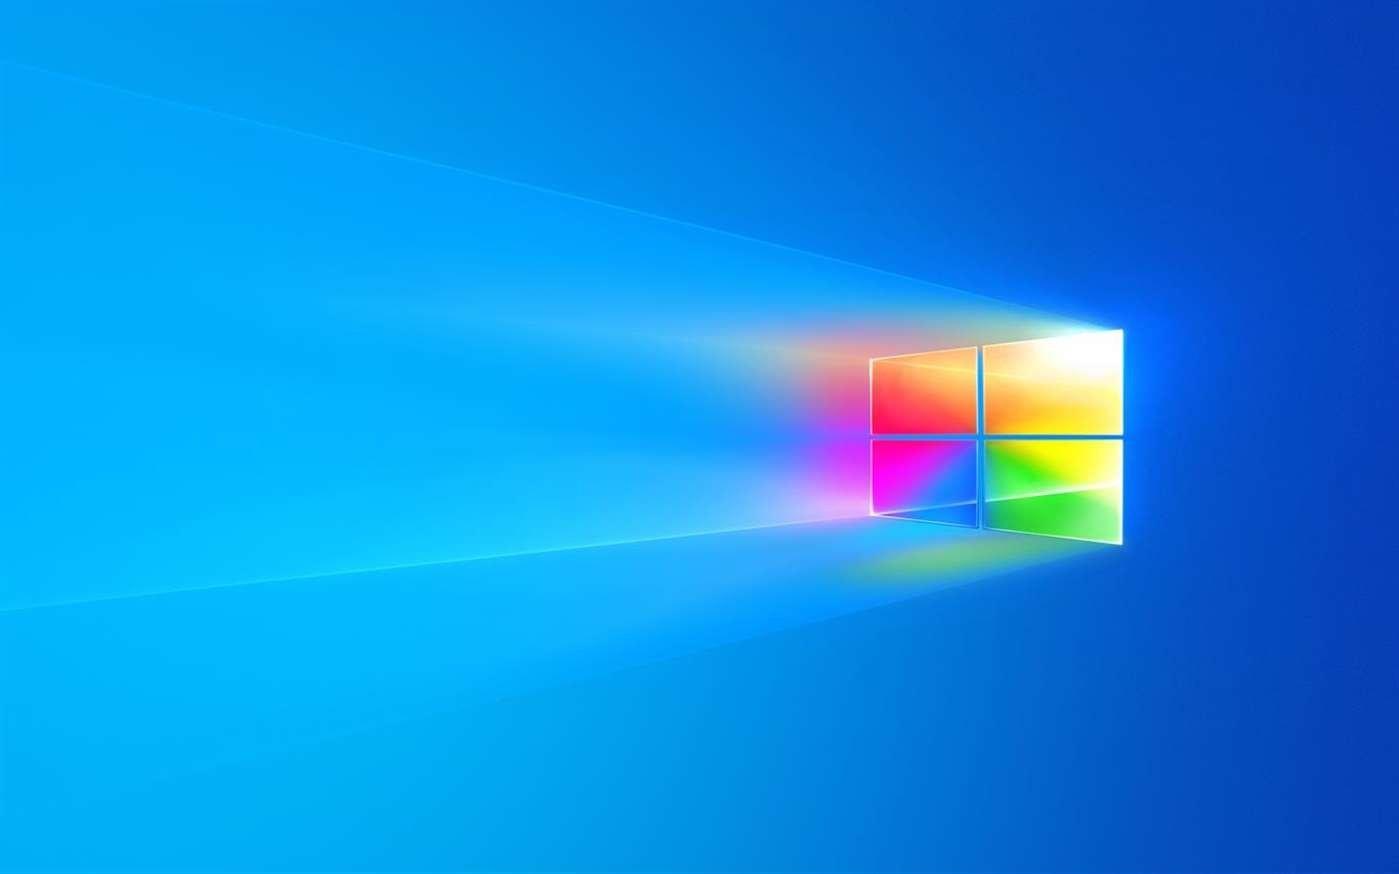 Windows 10 wallpaper colorido mod